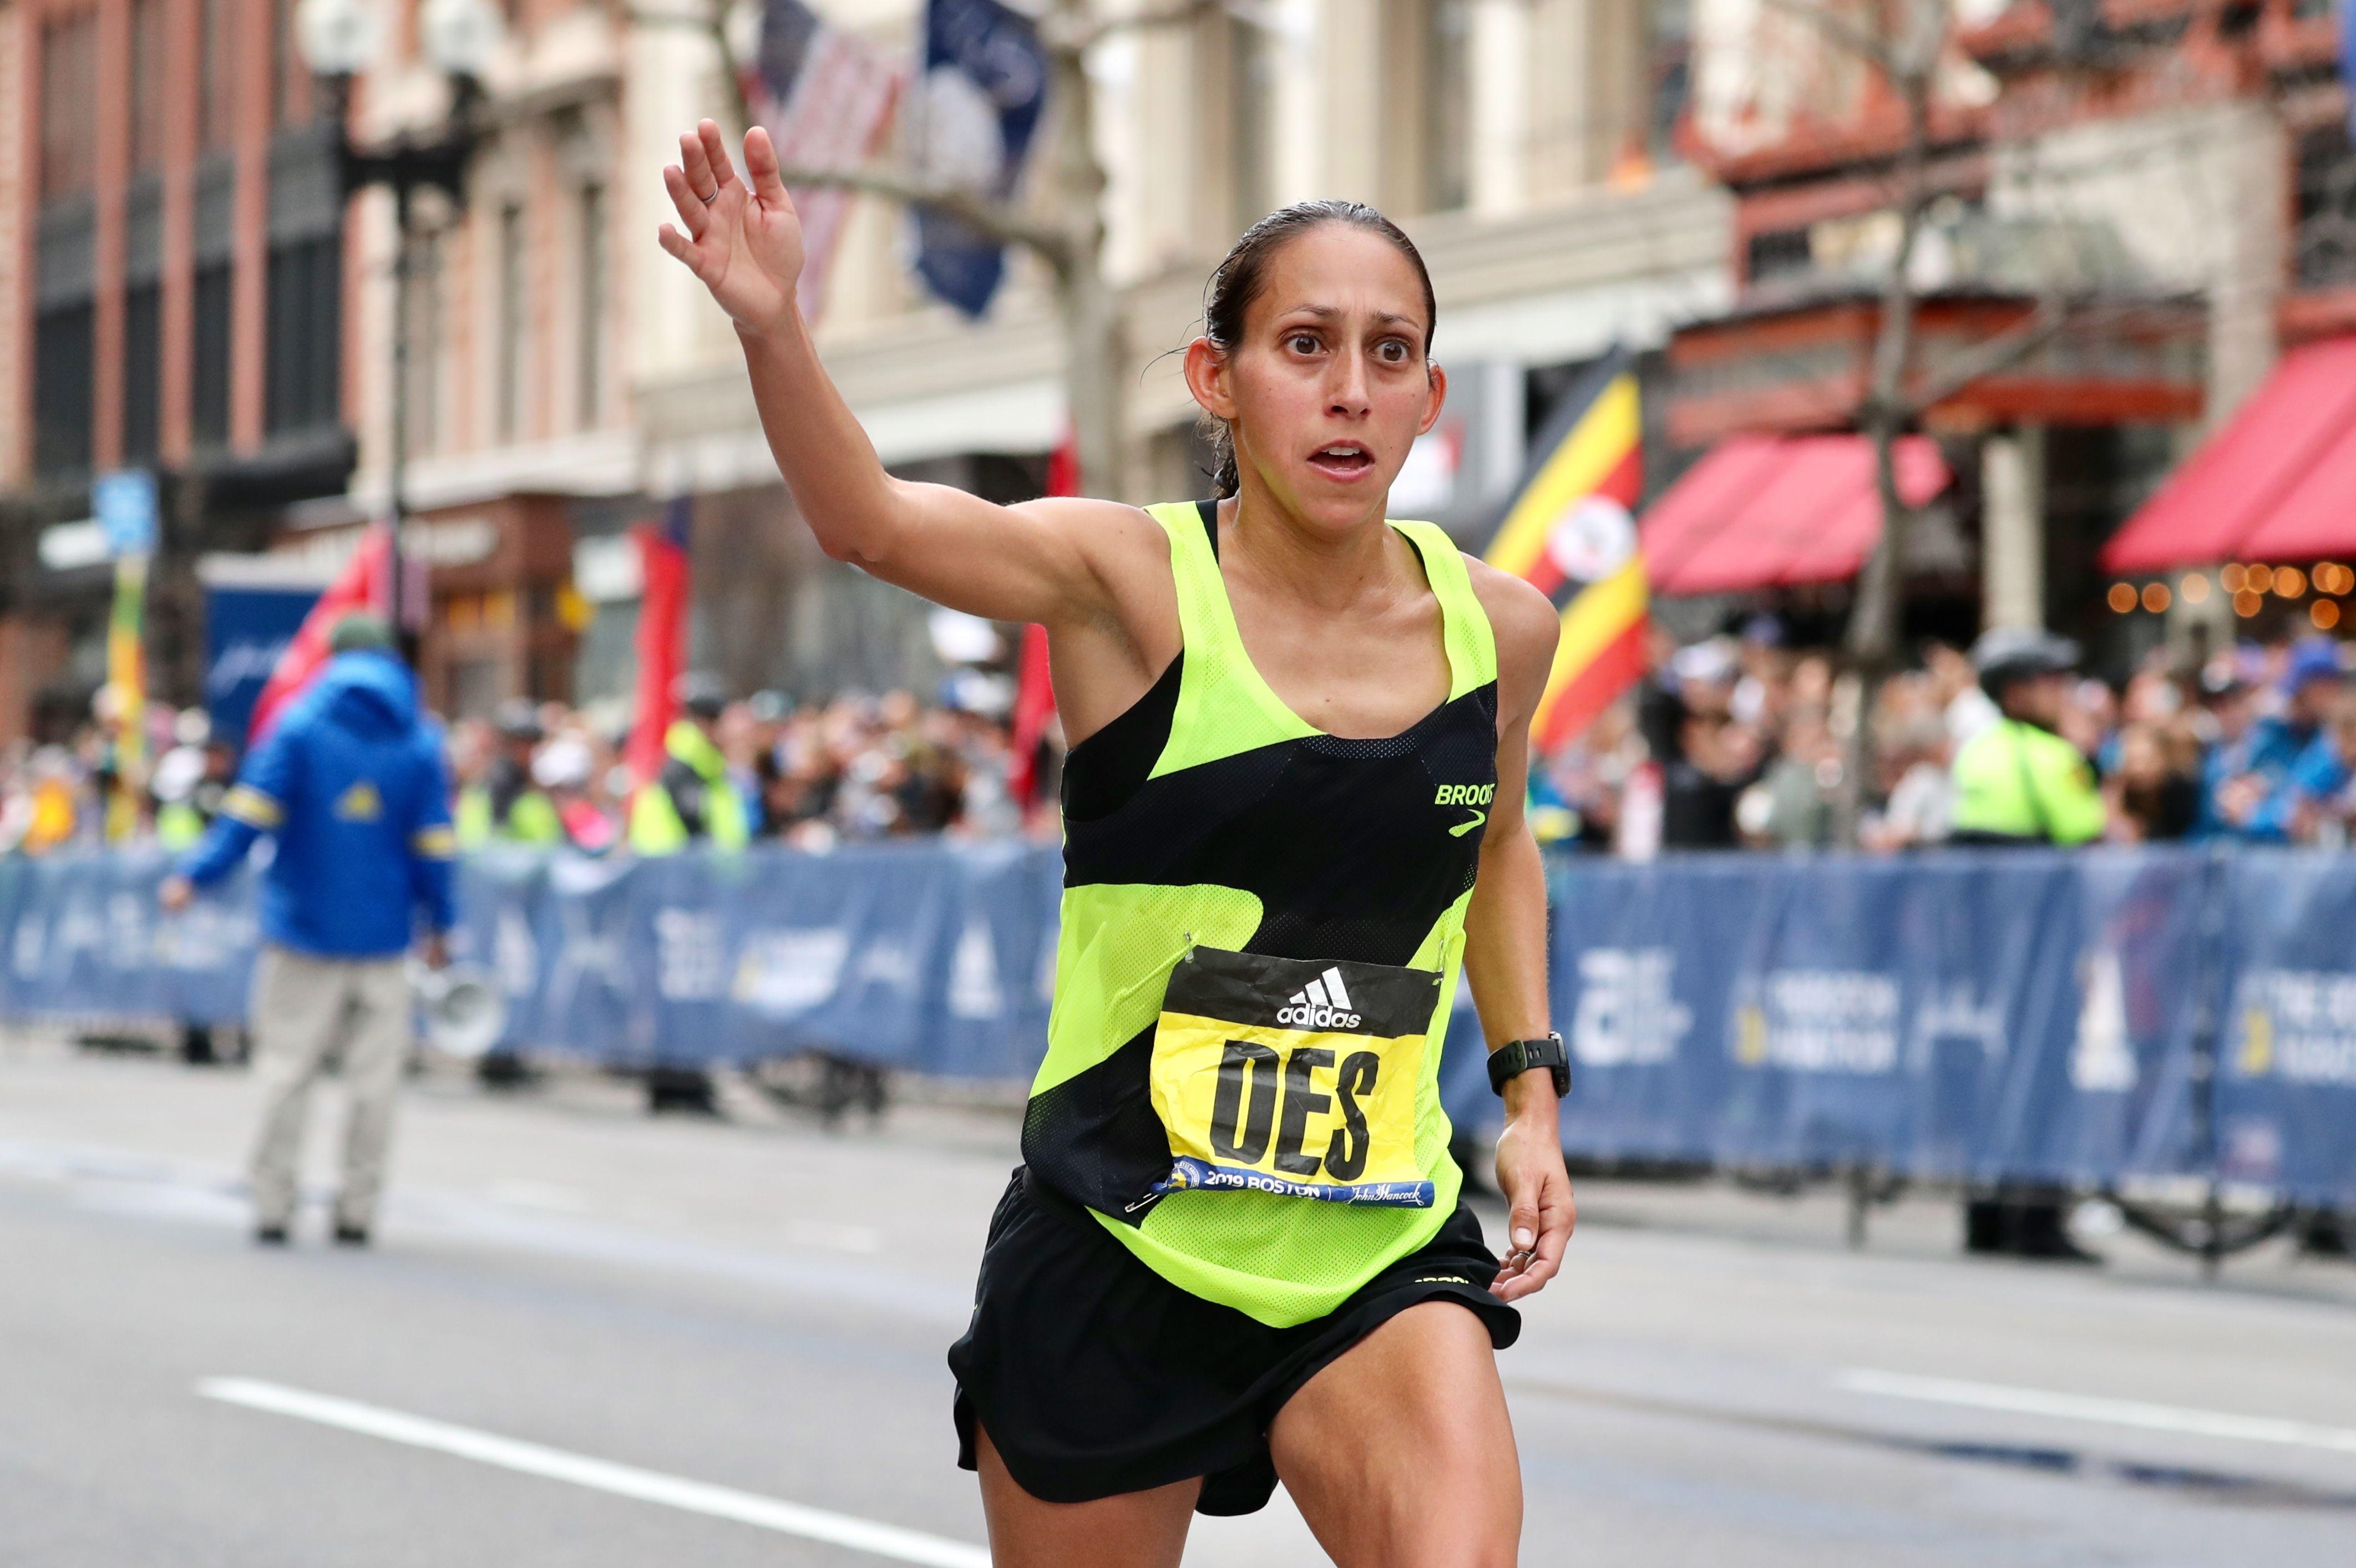 ab307a7a347 Desiree Linden Finishes Fifth at Boston Marathon - Des Lindon Boston  Marathon Results